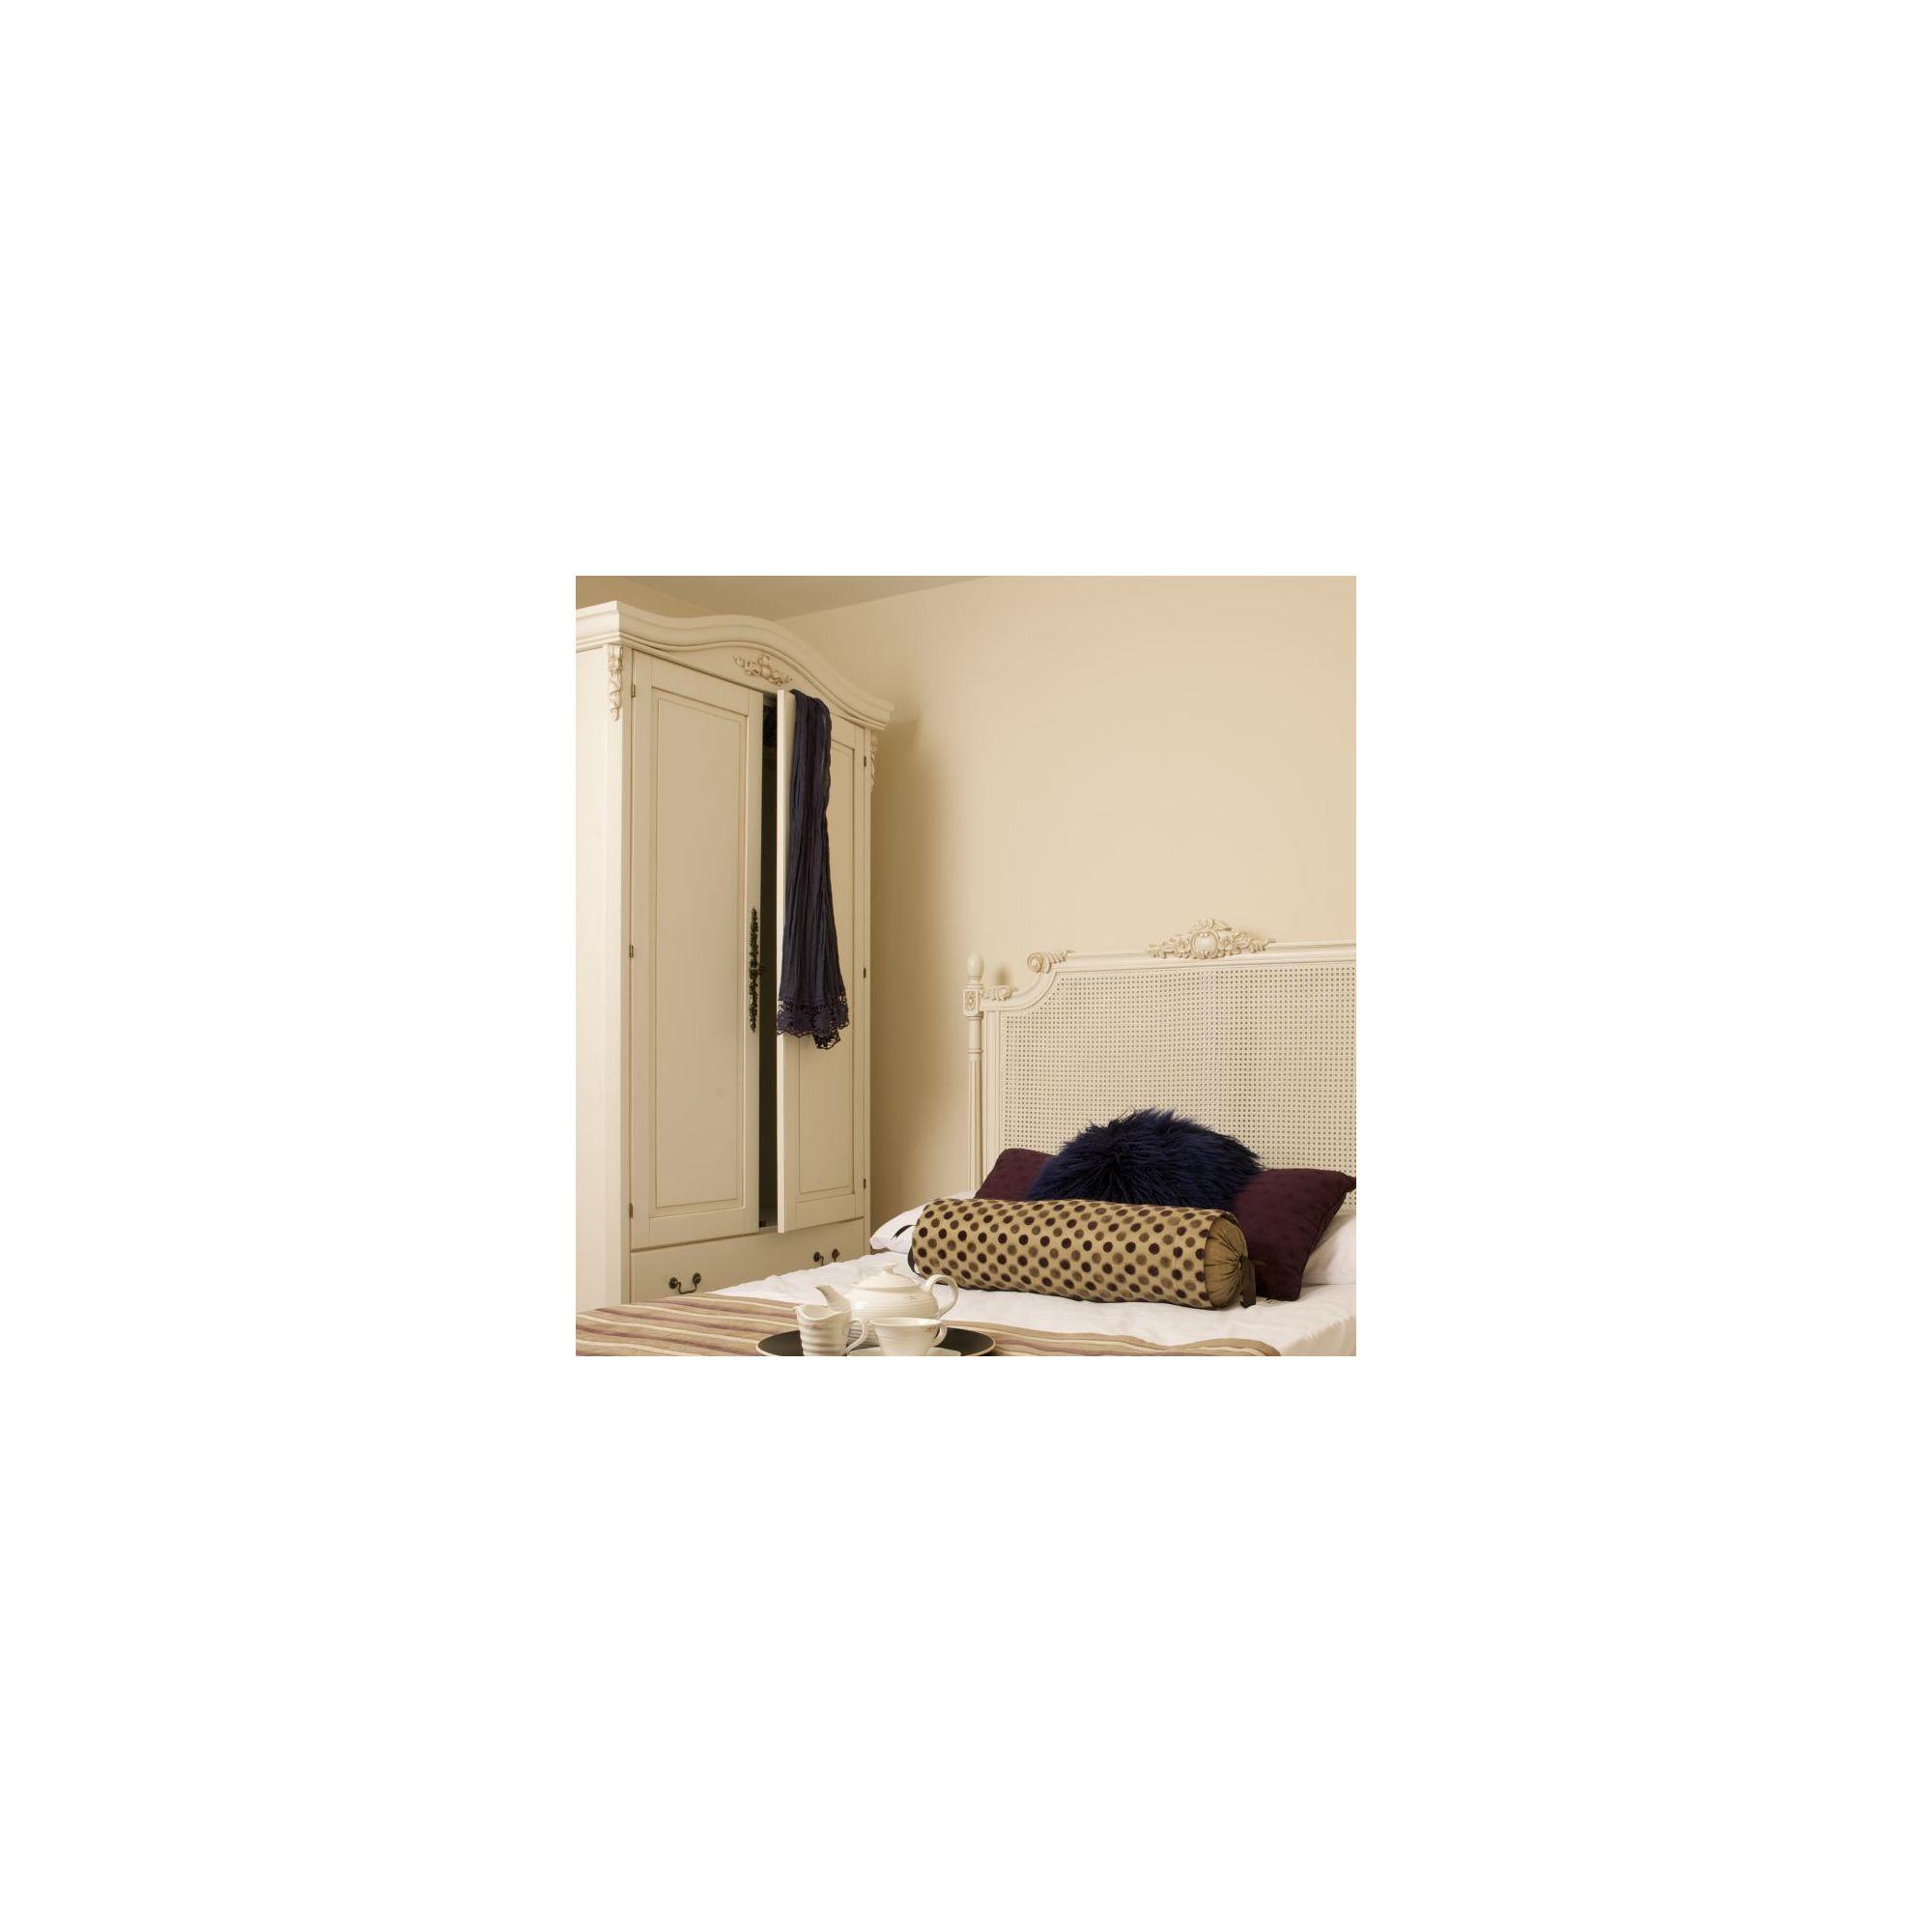 Kelburn Furniture Laurent 2 Door 2 Drawer Wardrobe at Tesco Direct